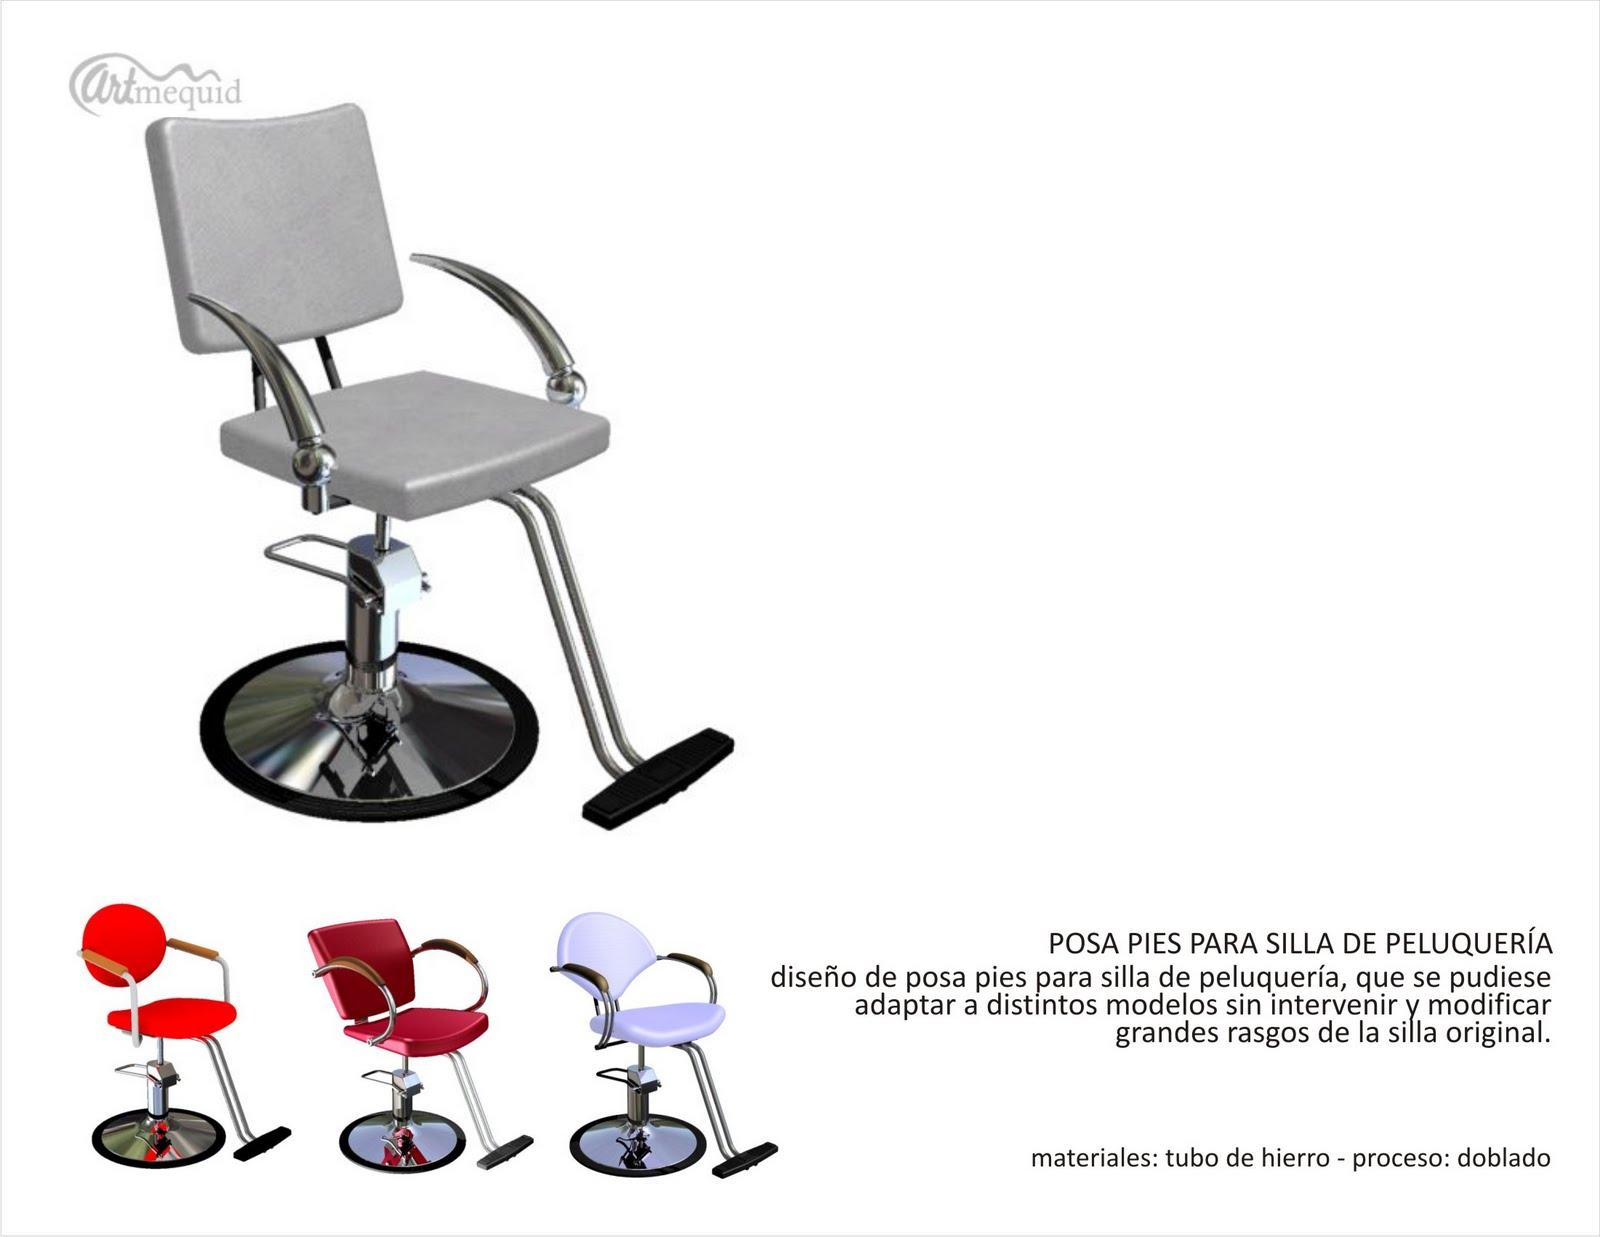 Portafolio posa pie para sillas de peluquer a for Sillas de peluqueria